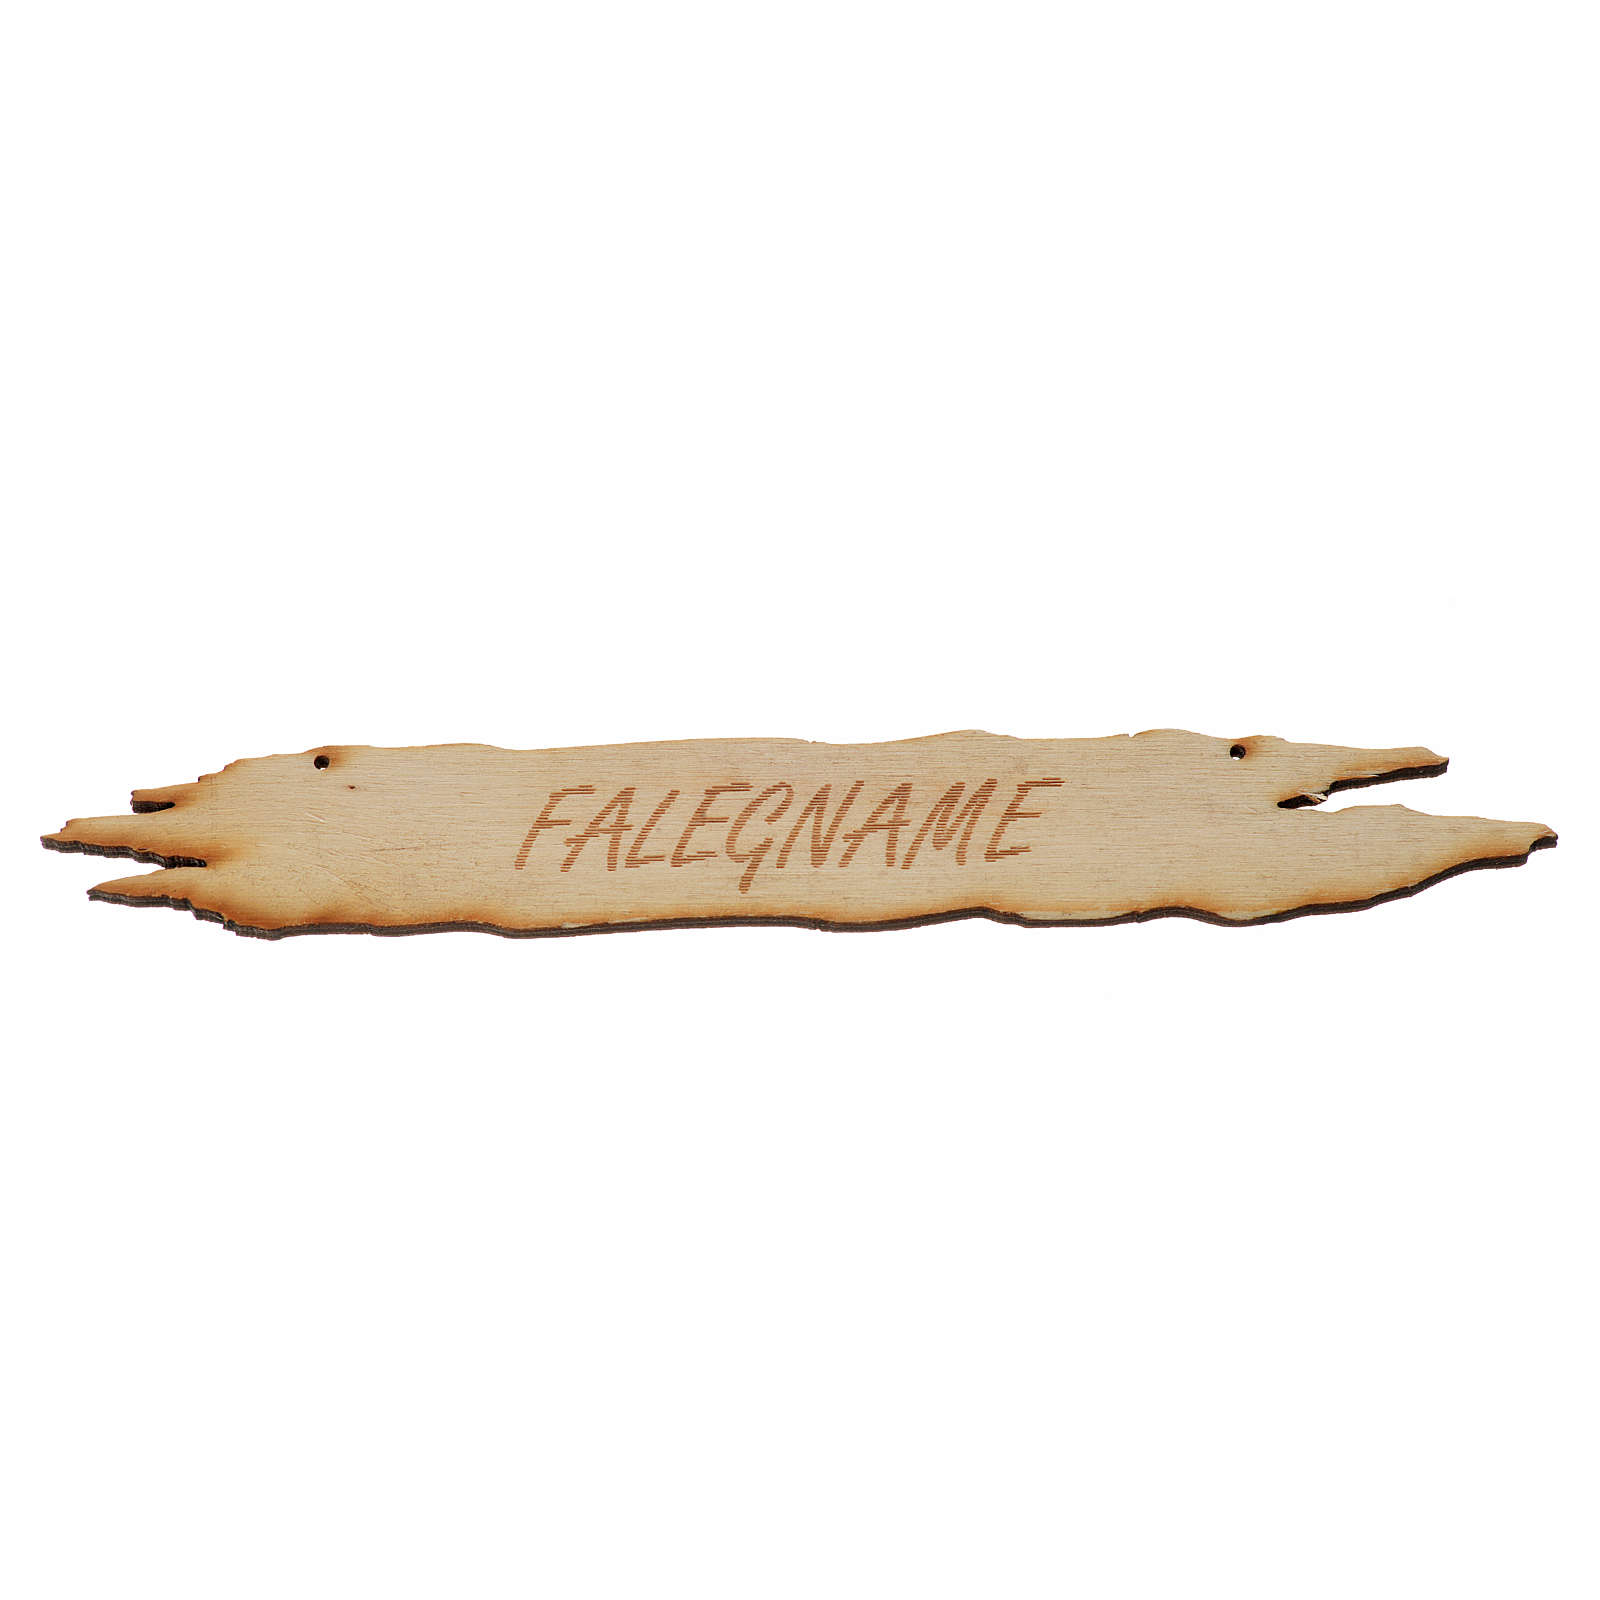 Insegna presepe Falegname 14 cm in legno 4